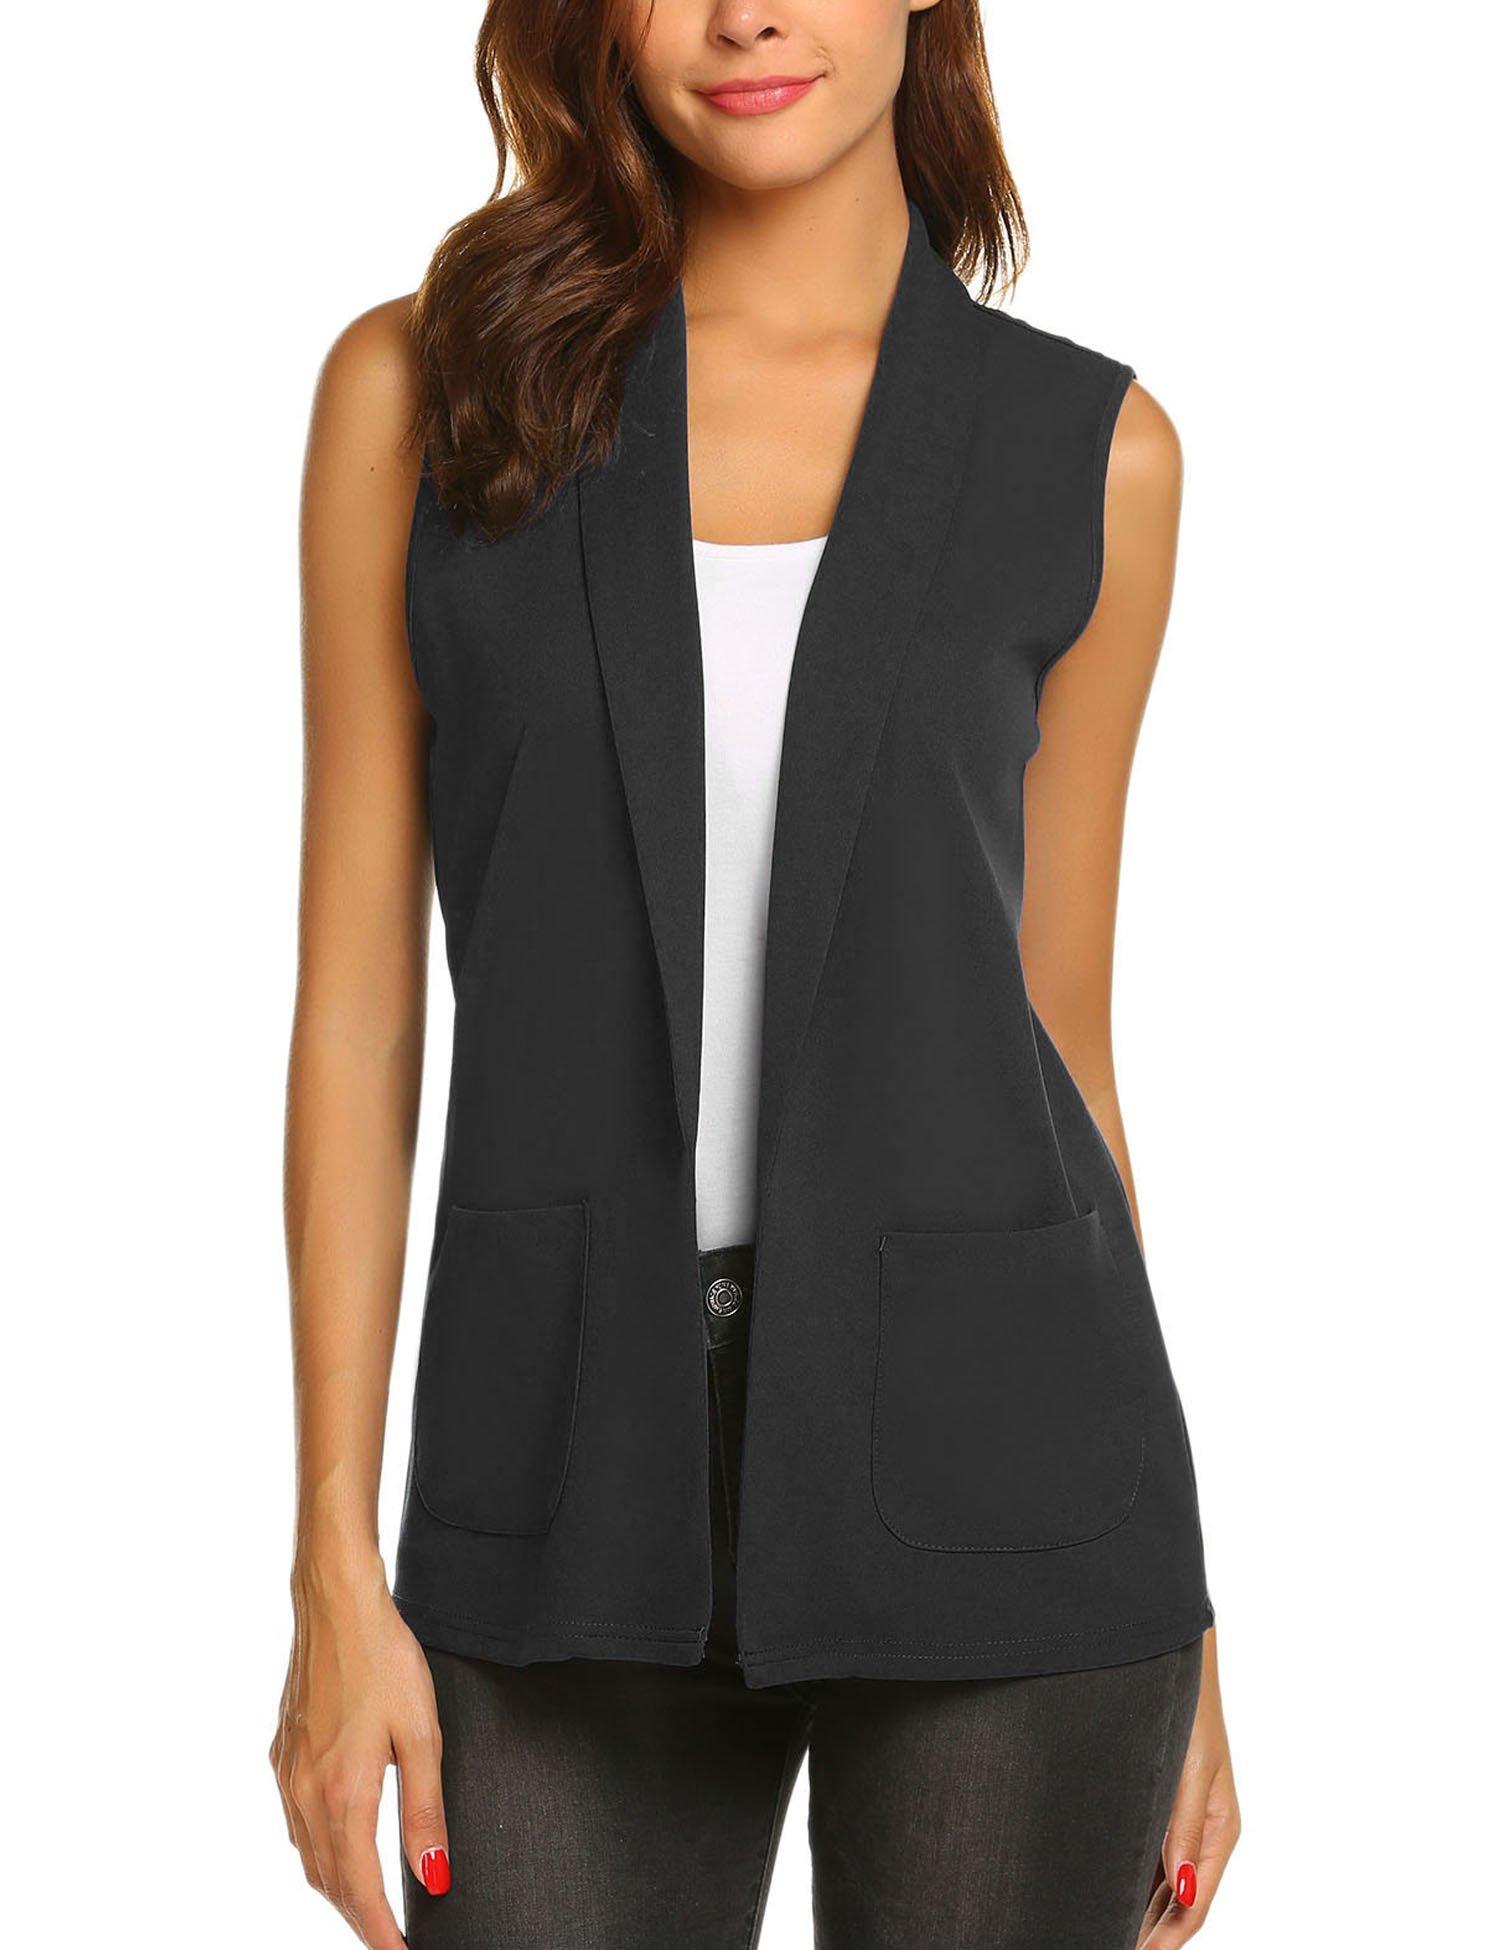 Dealwell Women Oversized Open Blazer Vest Sleeveless Waistcoat Jacket Cardigan Coat (Black, Large)